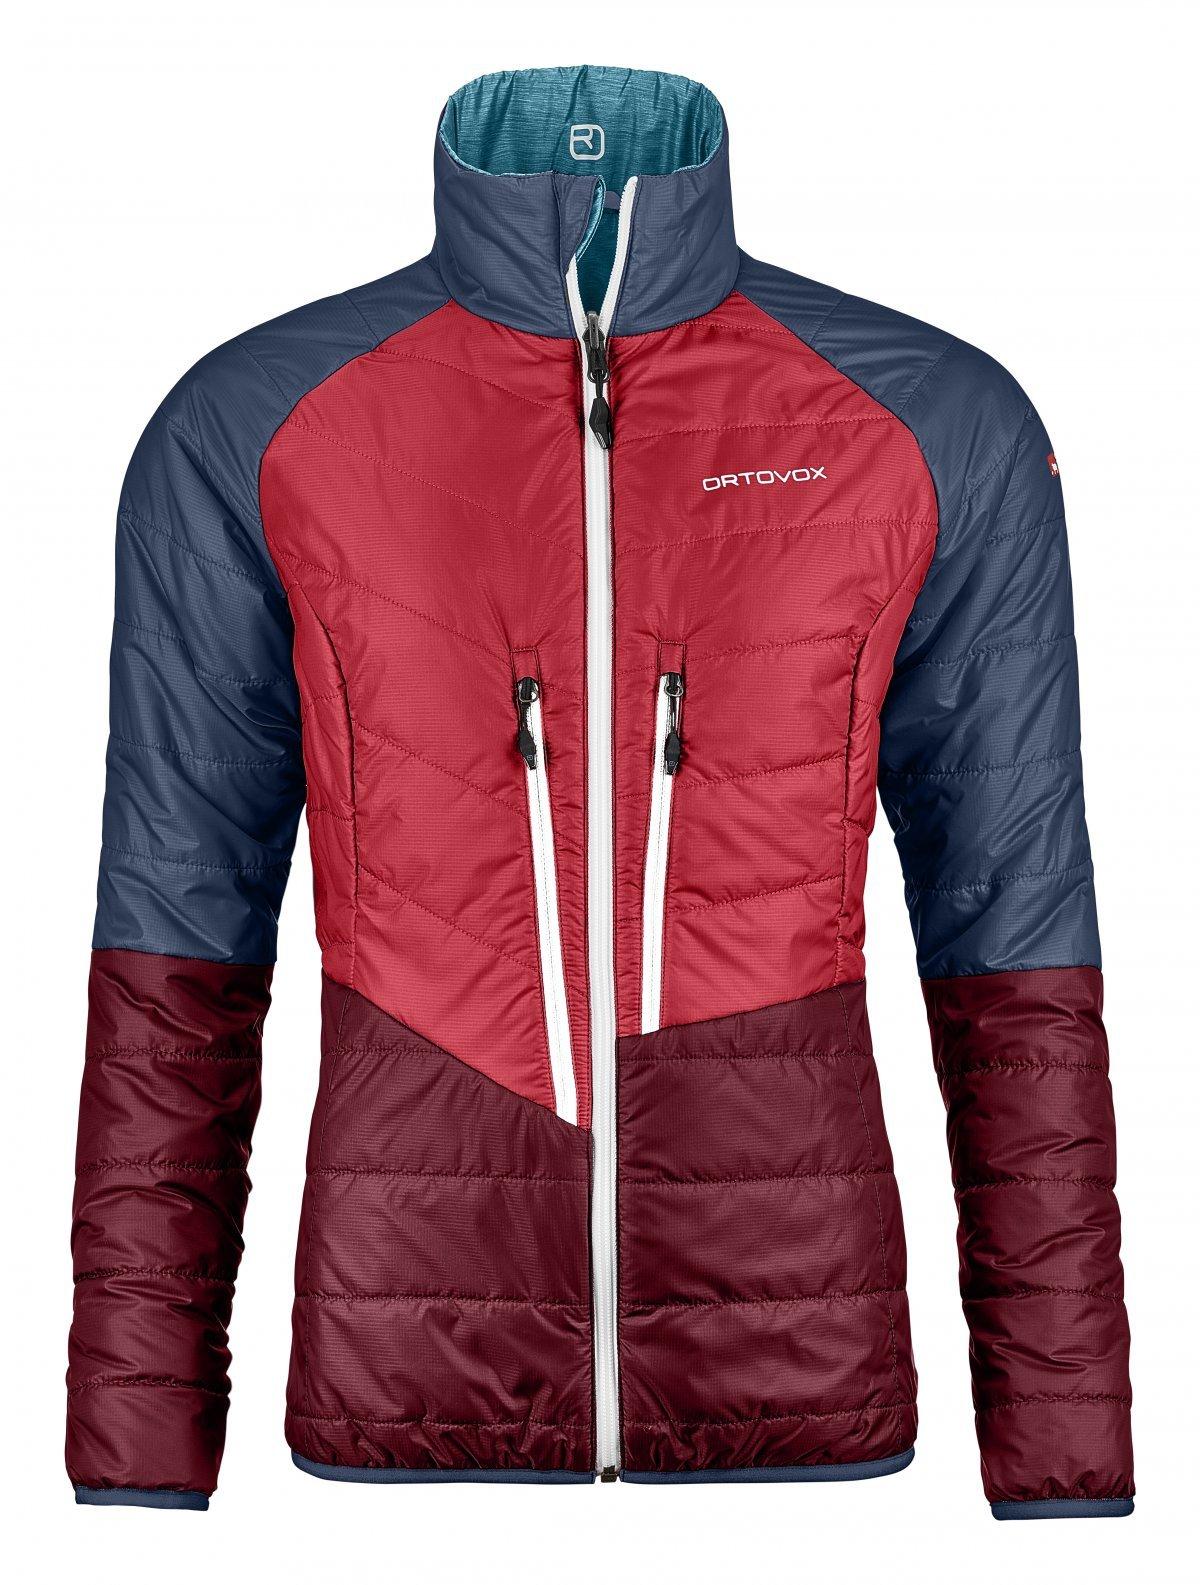 Ortovox Women's Piz Bial Jacket Aqua Blend S